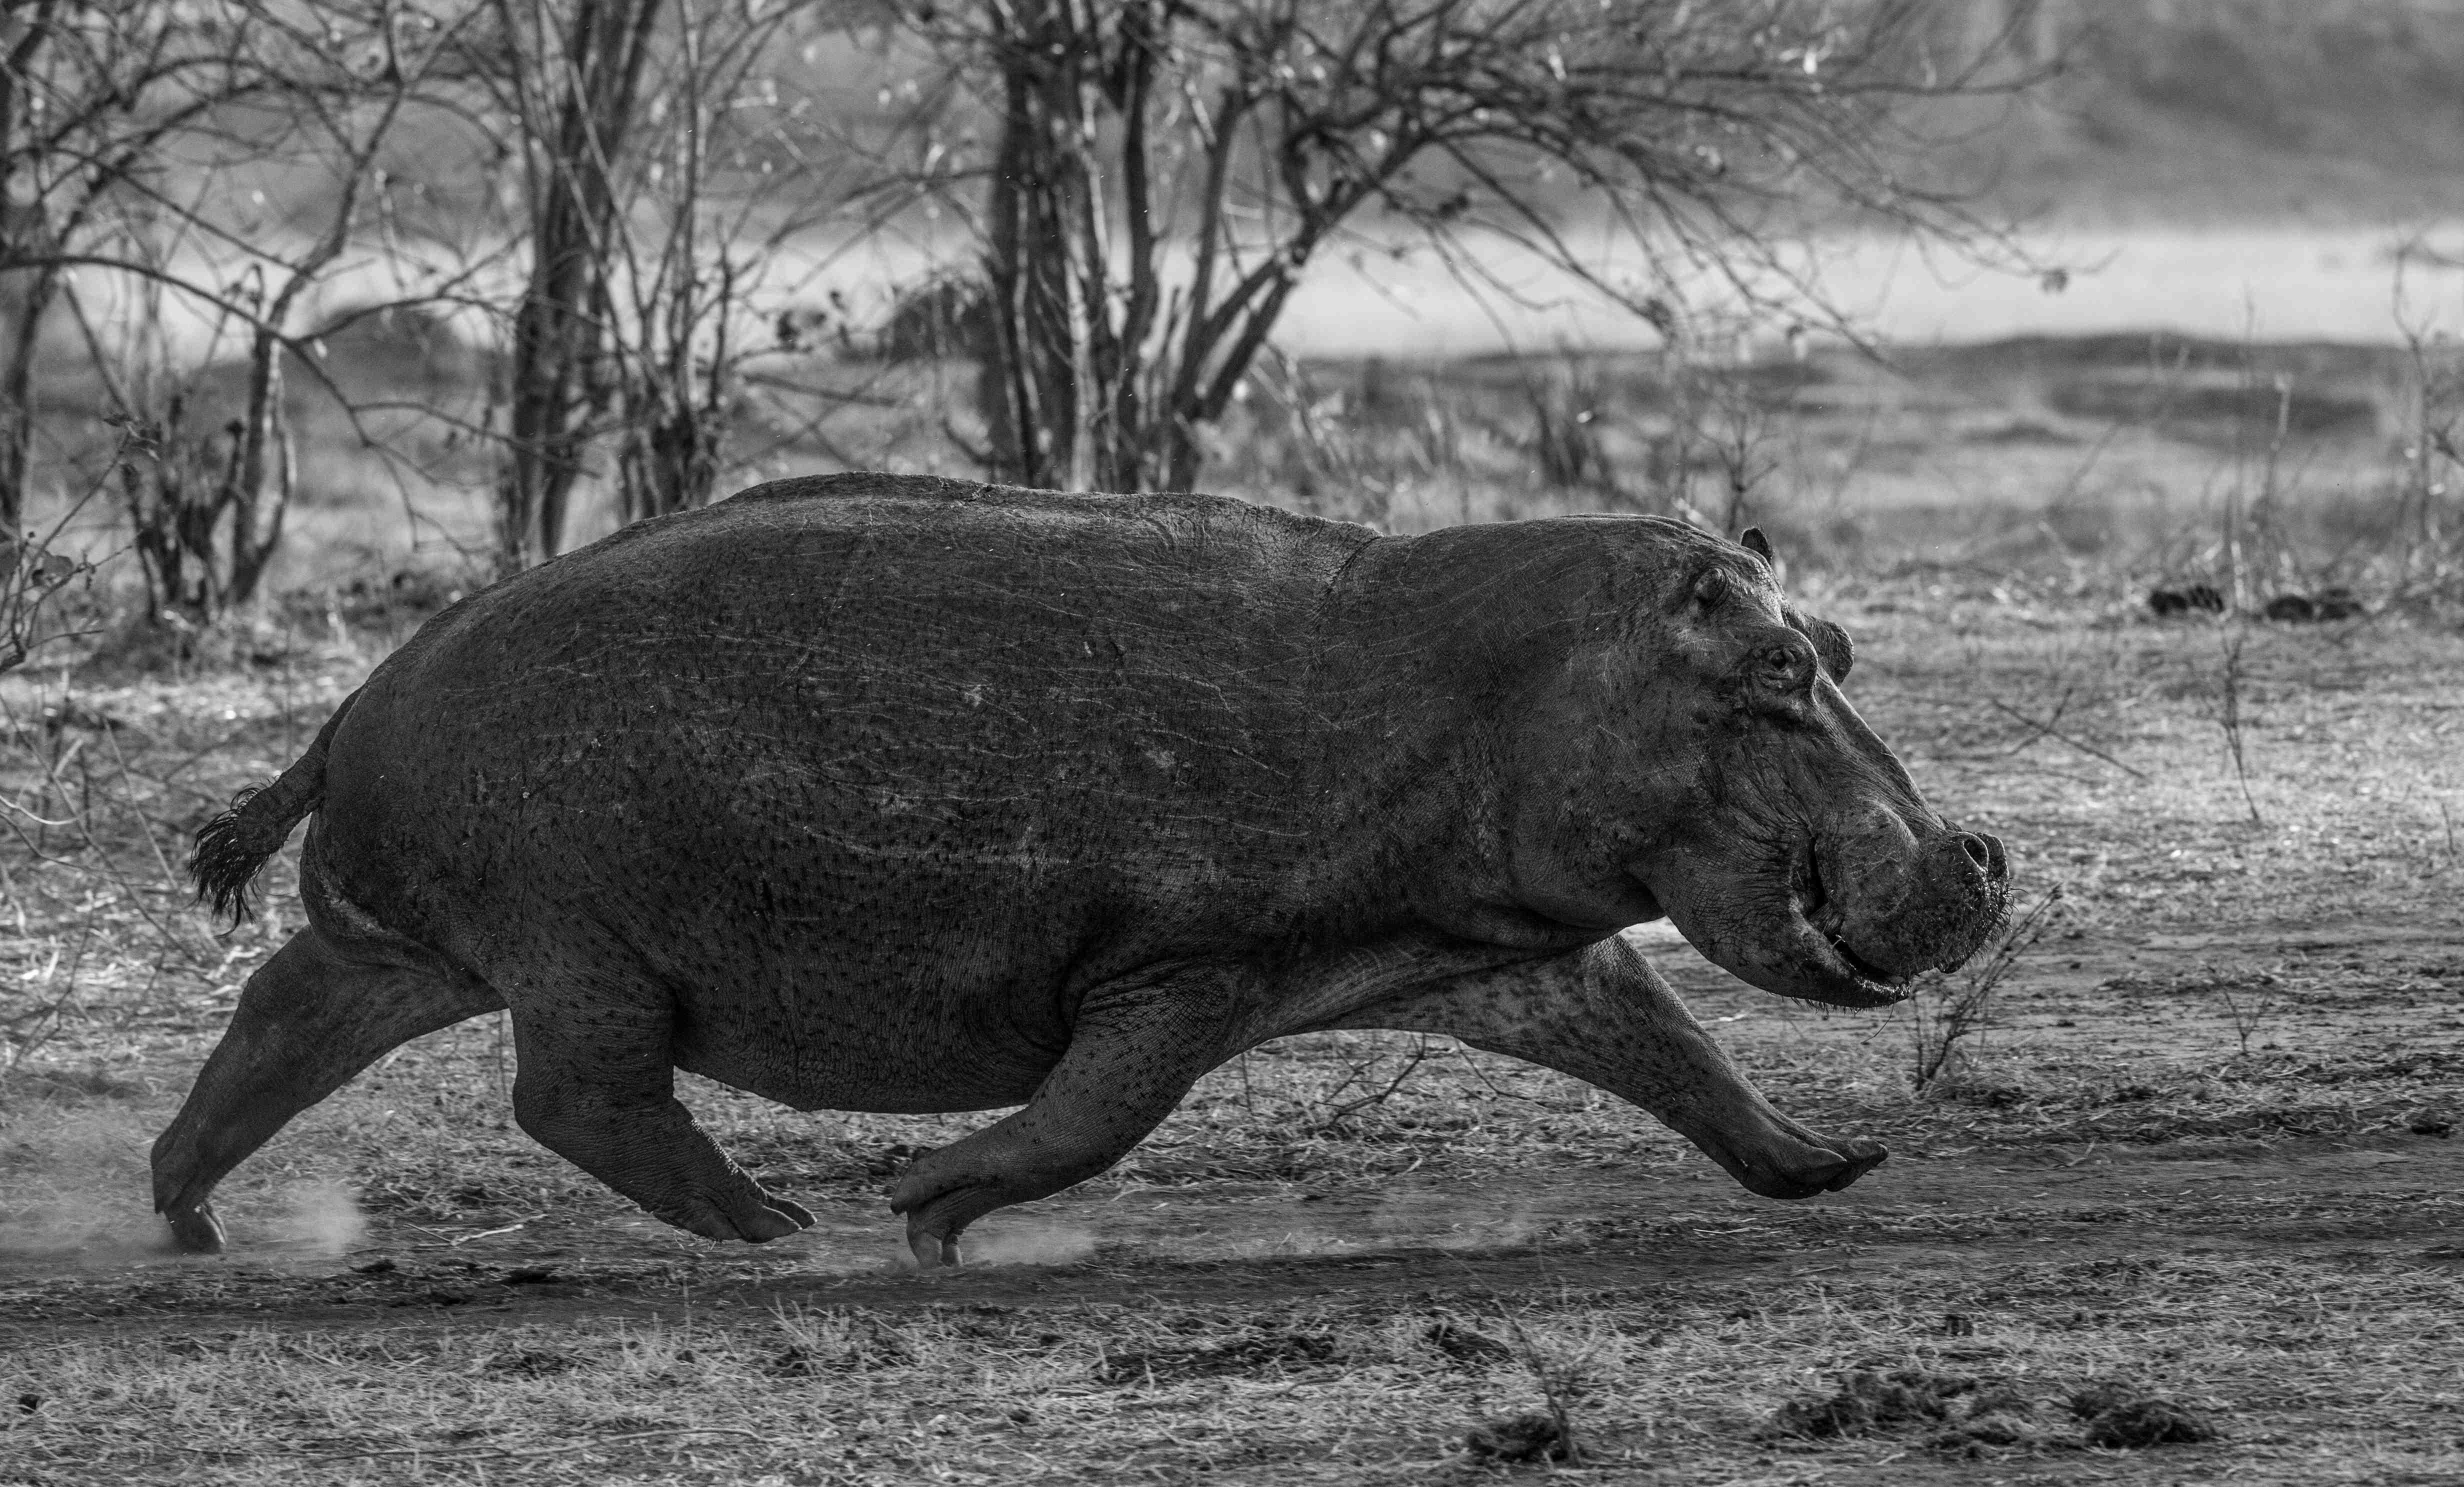 David Yarrow Hippos in Zambia 2